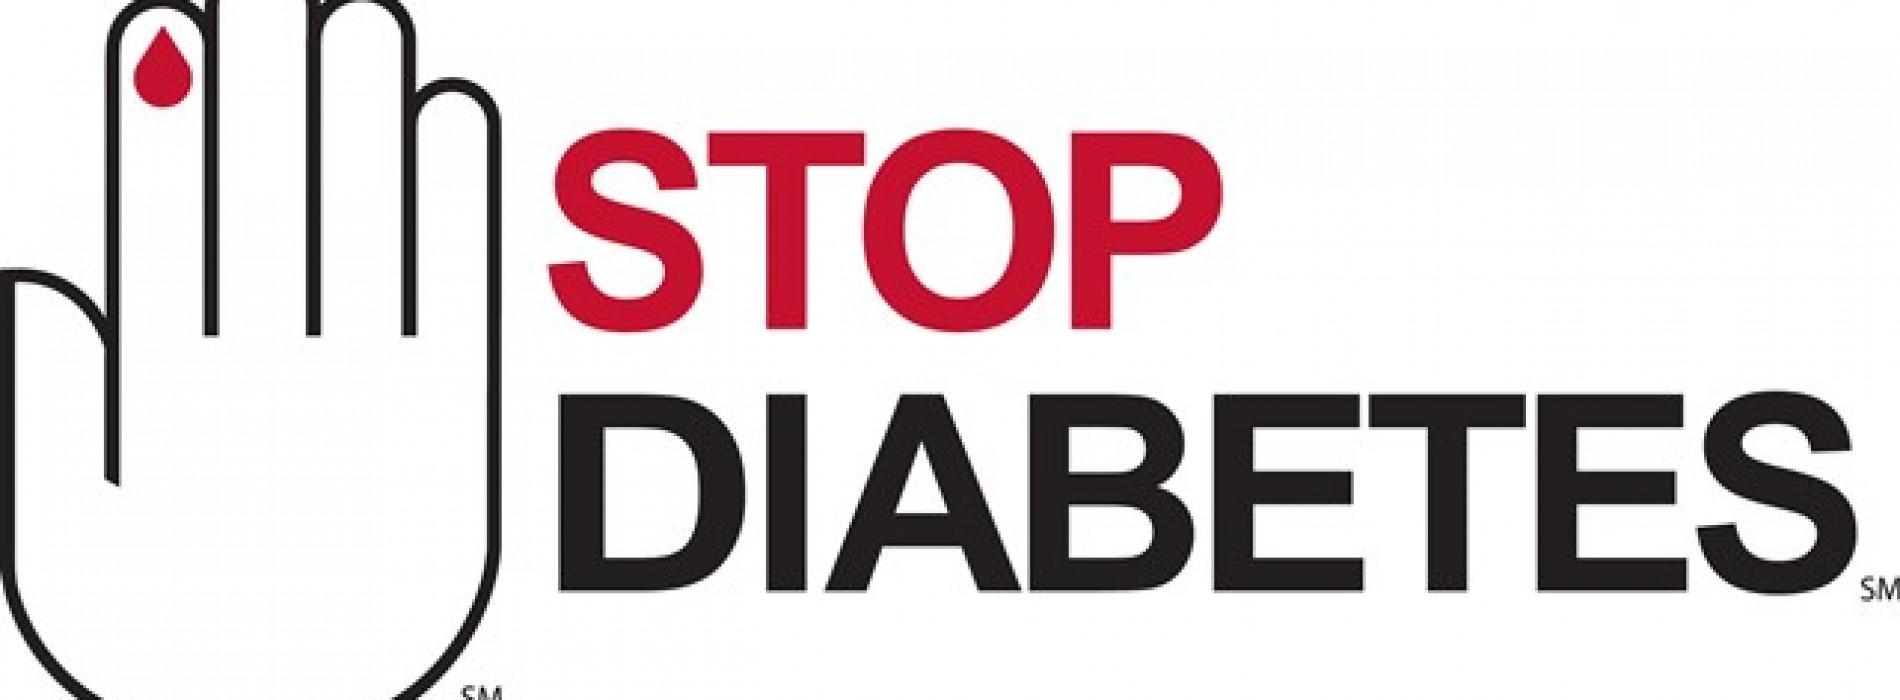 US-based hospital to build diabetes facilities across Nigeria